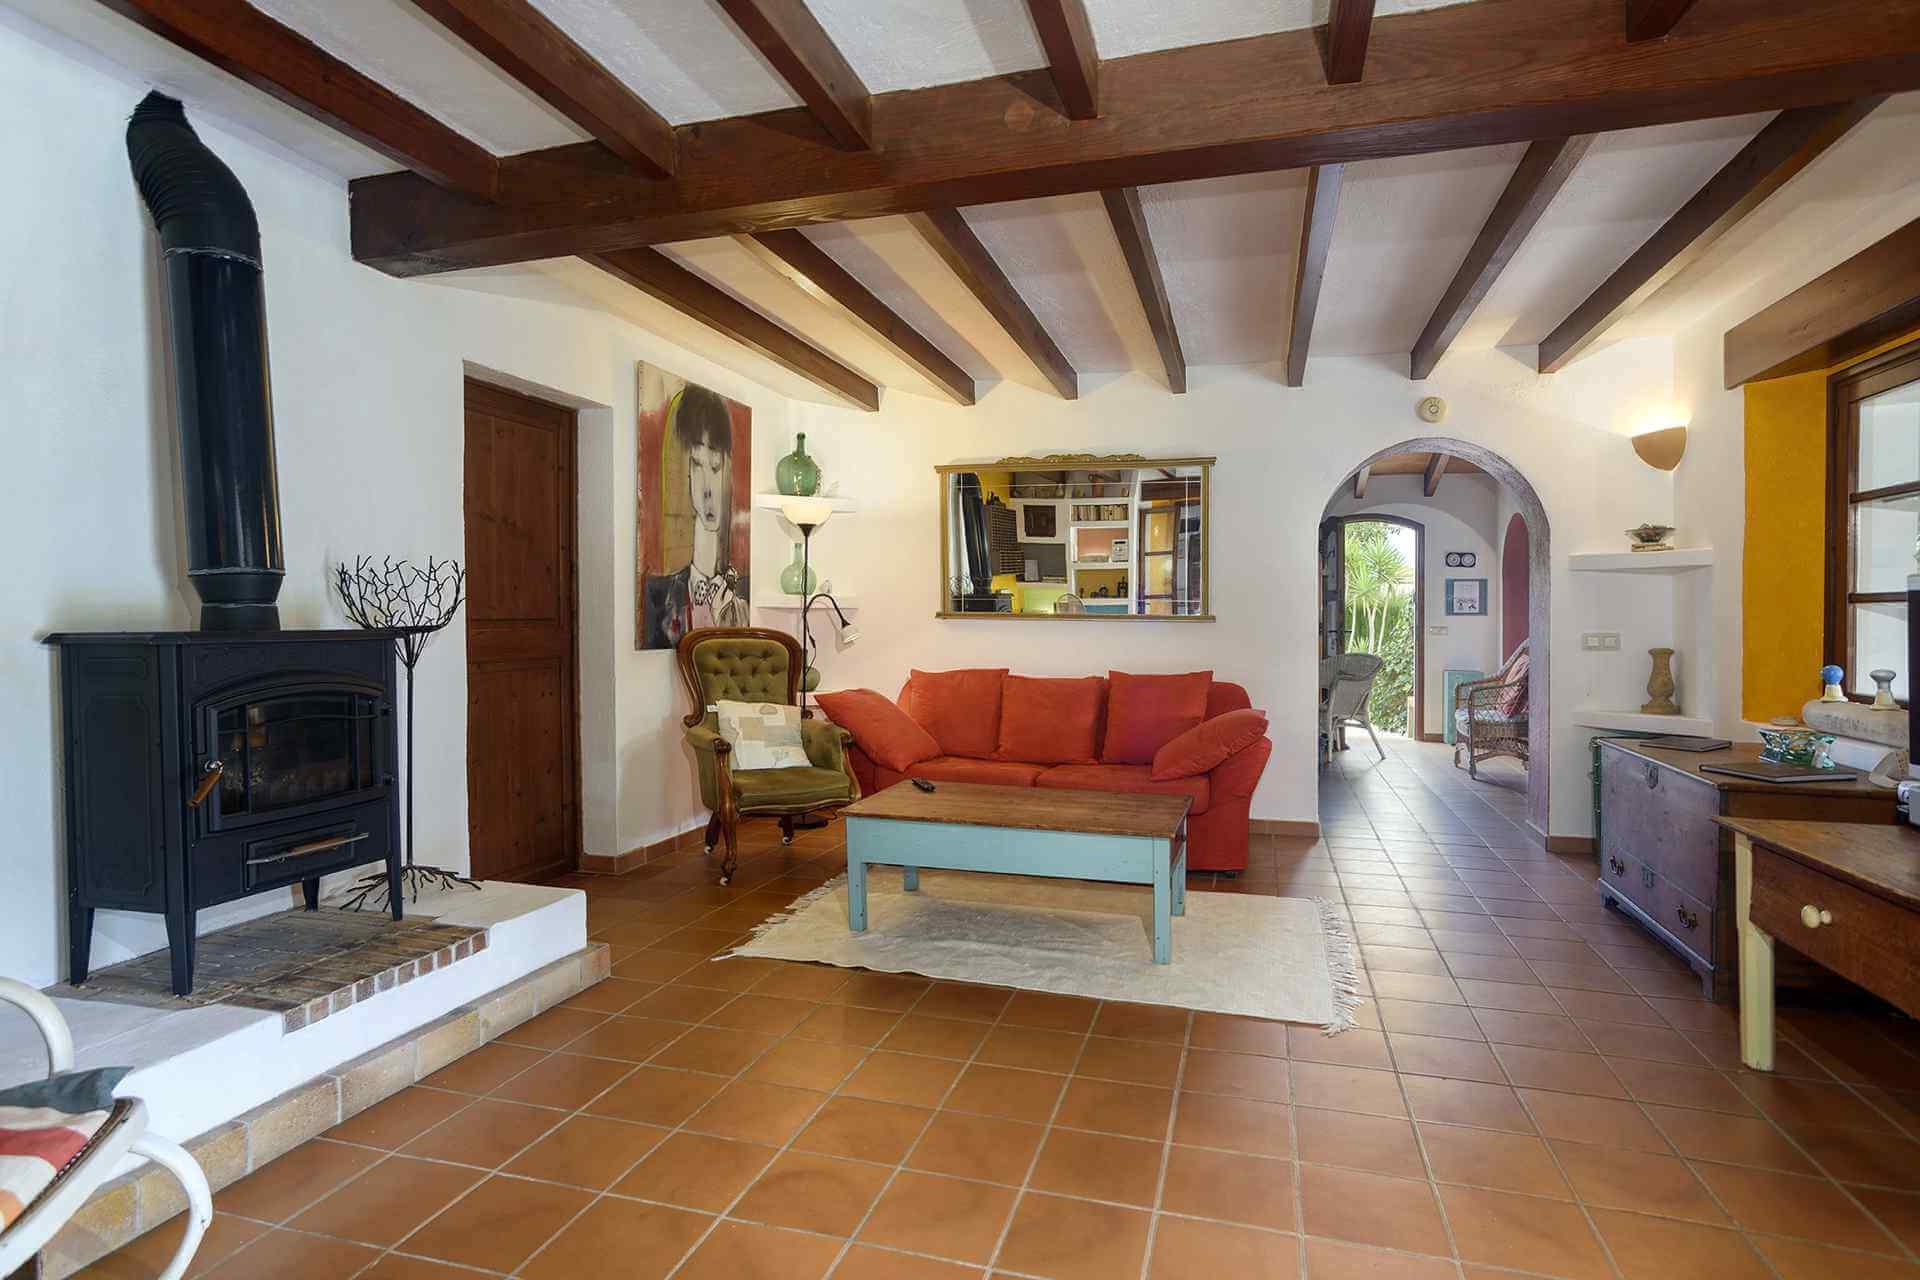 01-161 Finca mit hübschem Garten Mallorca Norden Bild 8